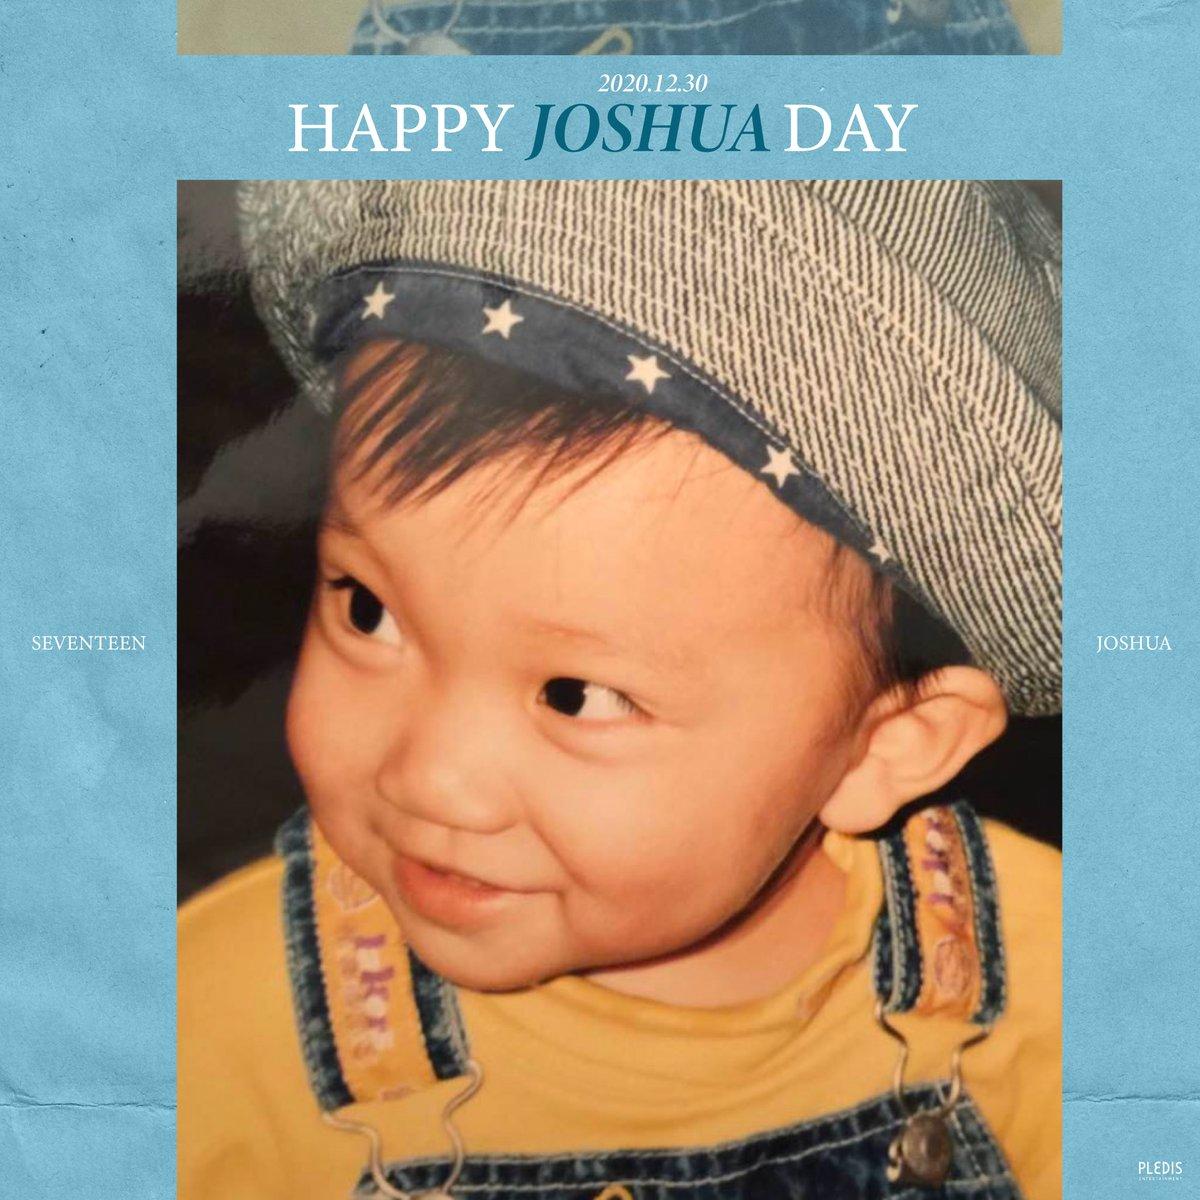 20201230 Happy JOSHUA's Day🦌  #Happy_JOSHUA_Day  #조슈아 #JOSHUA #세븐틴 #SEVENTEEN